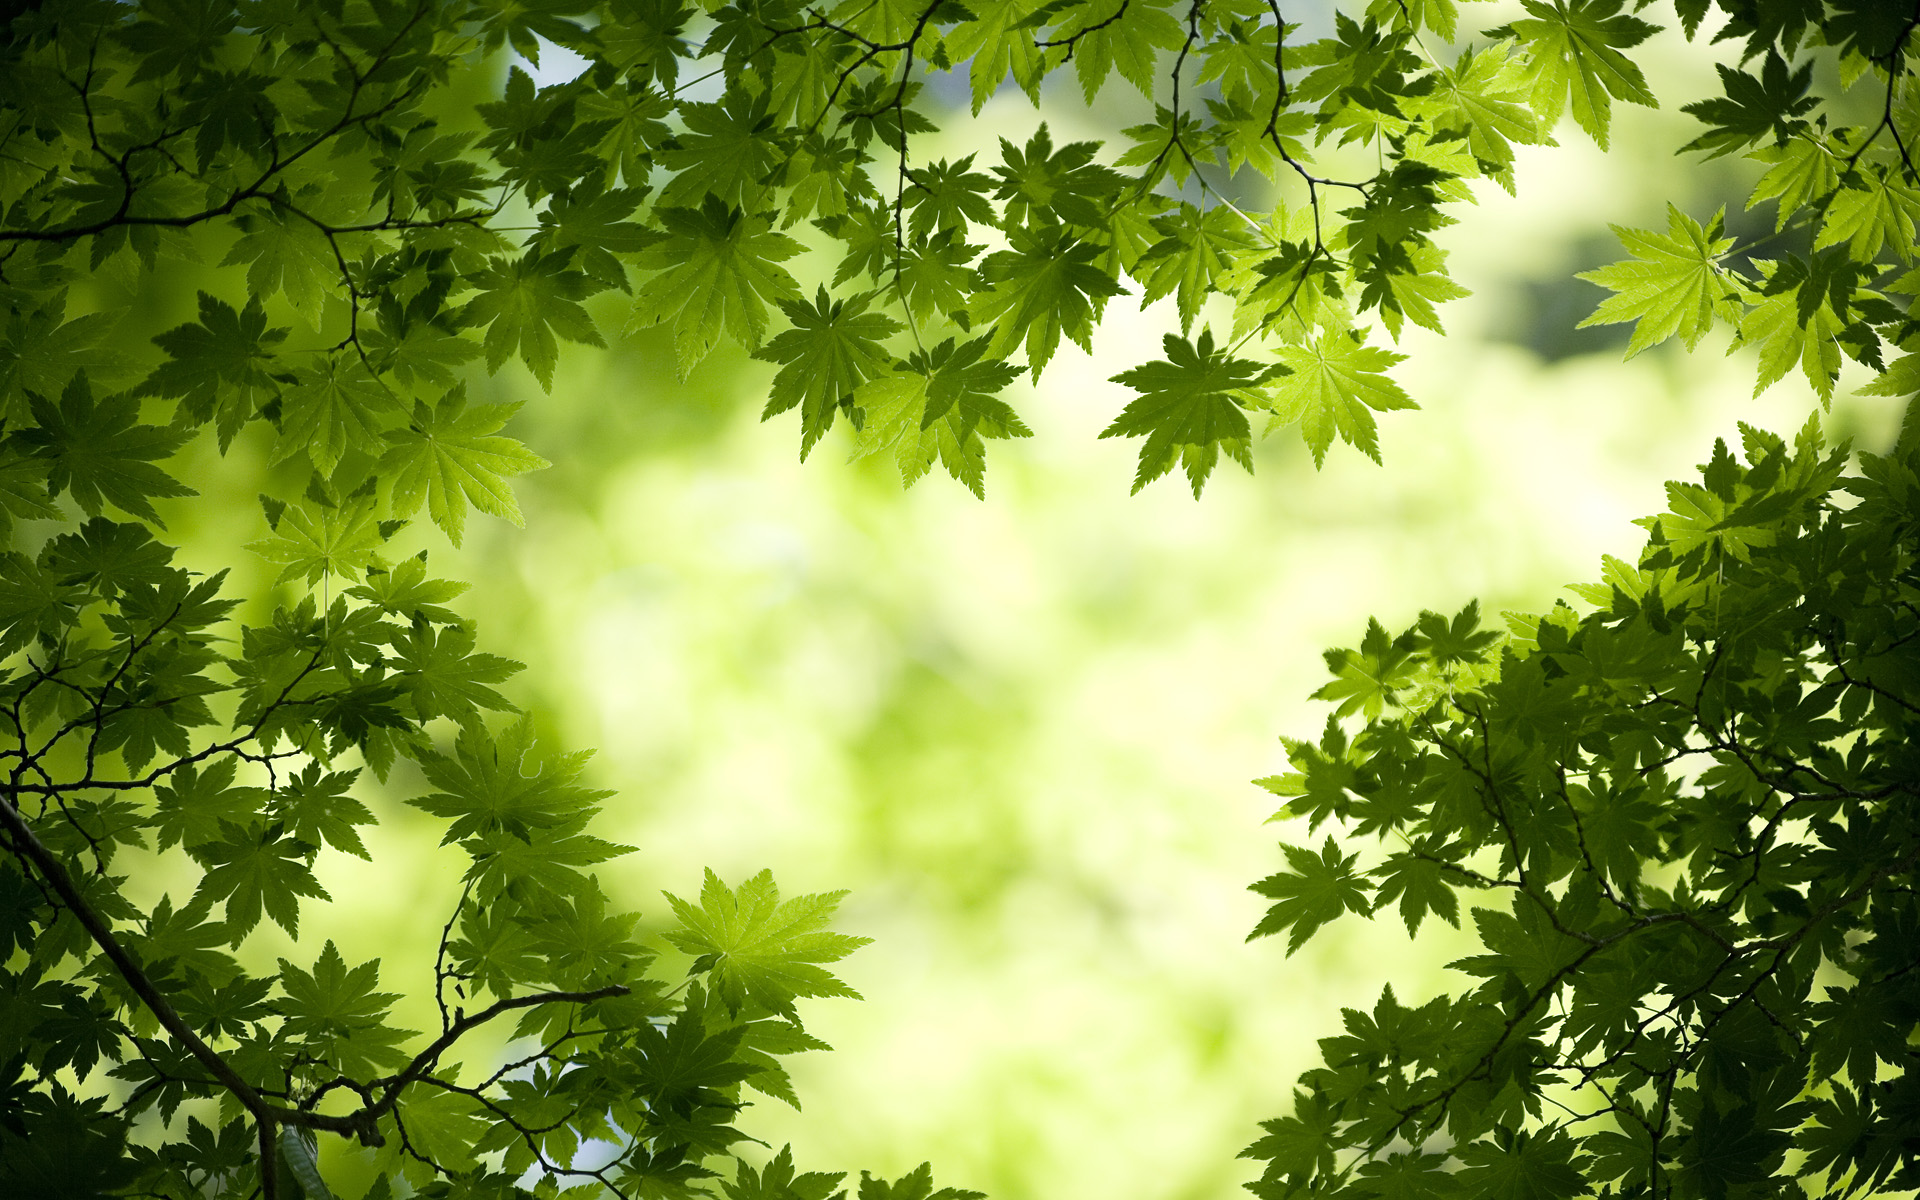 Hd Thanksgiving Wallpaper Free Green Leaves Wallpapers Pixelstalk Net